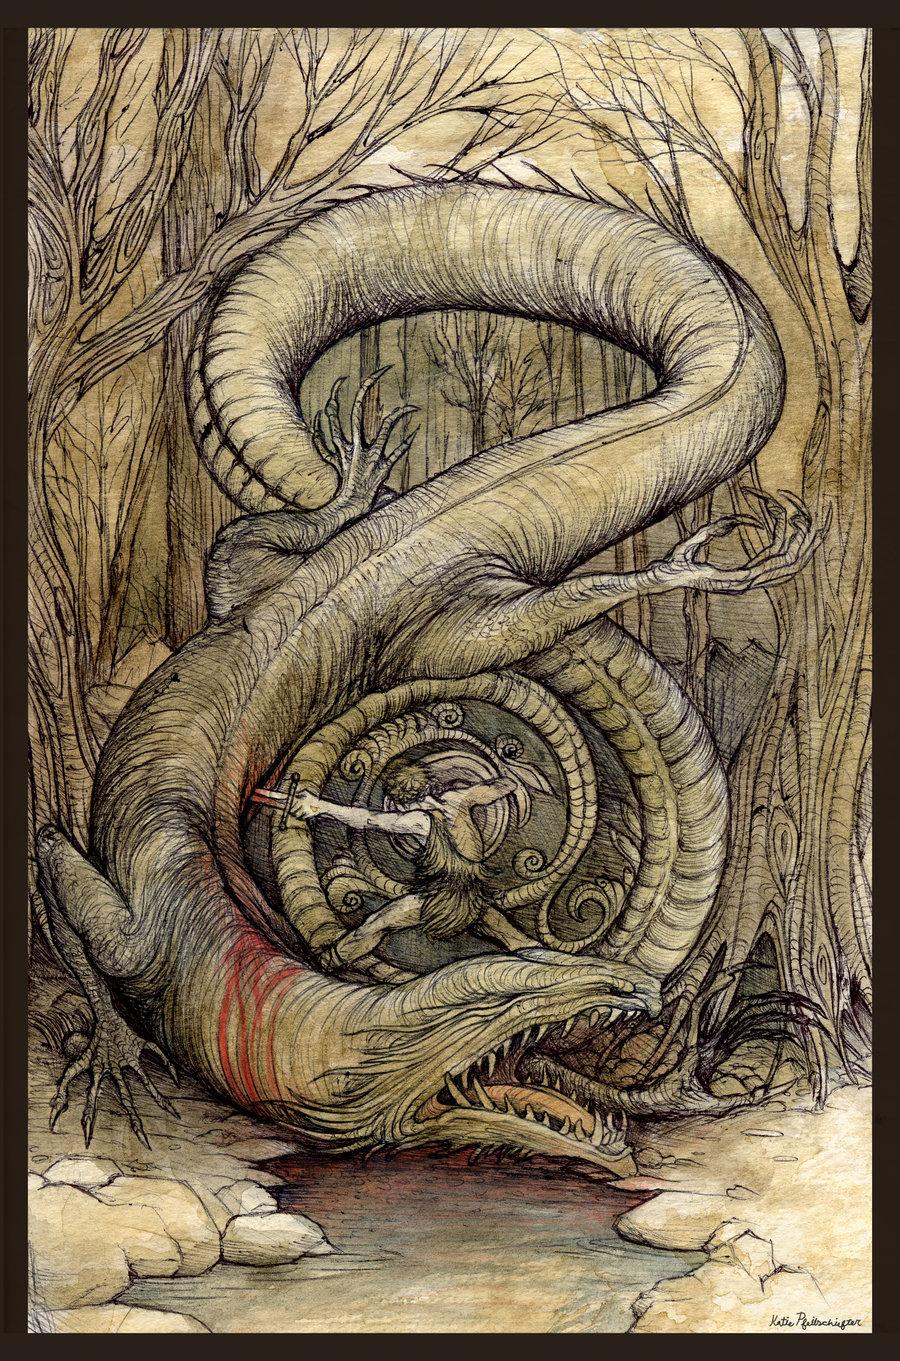 Sigurðr giết Fáfnir – tranh của Kate Pfeilschiefter